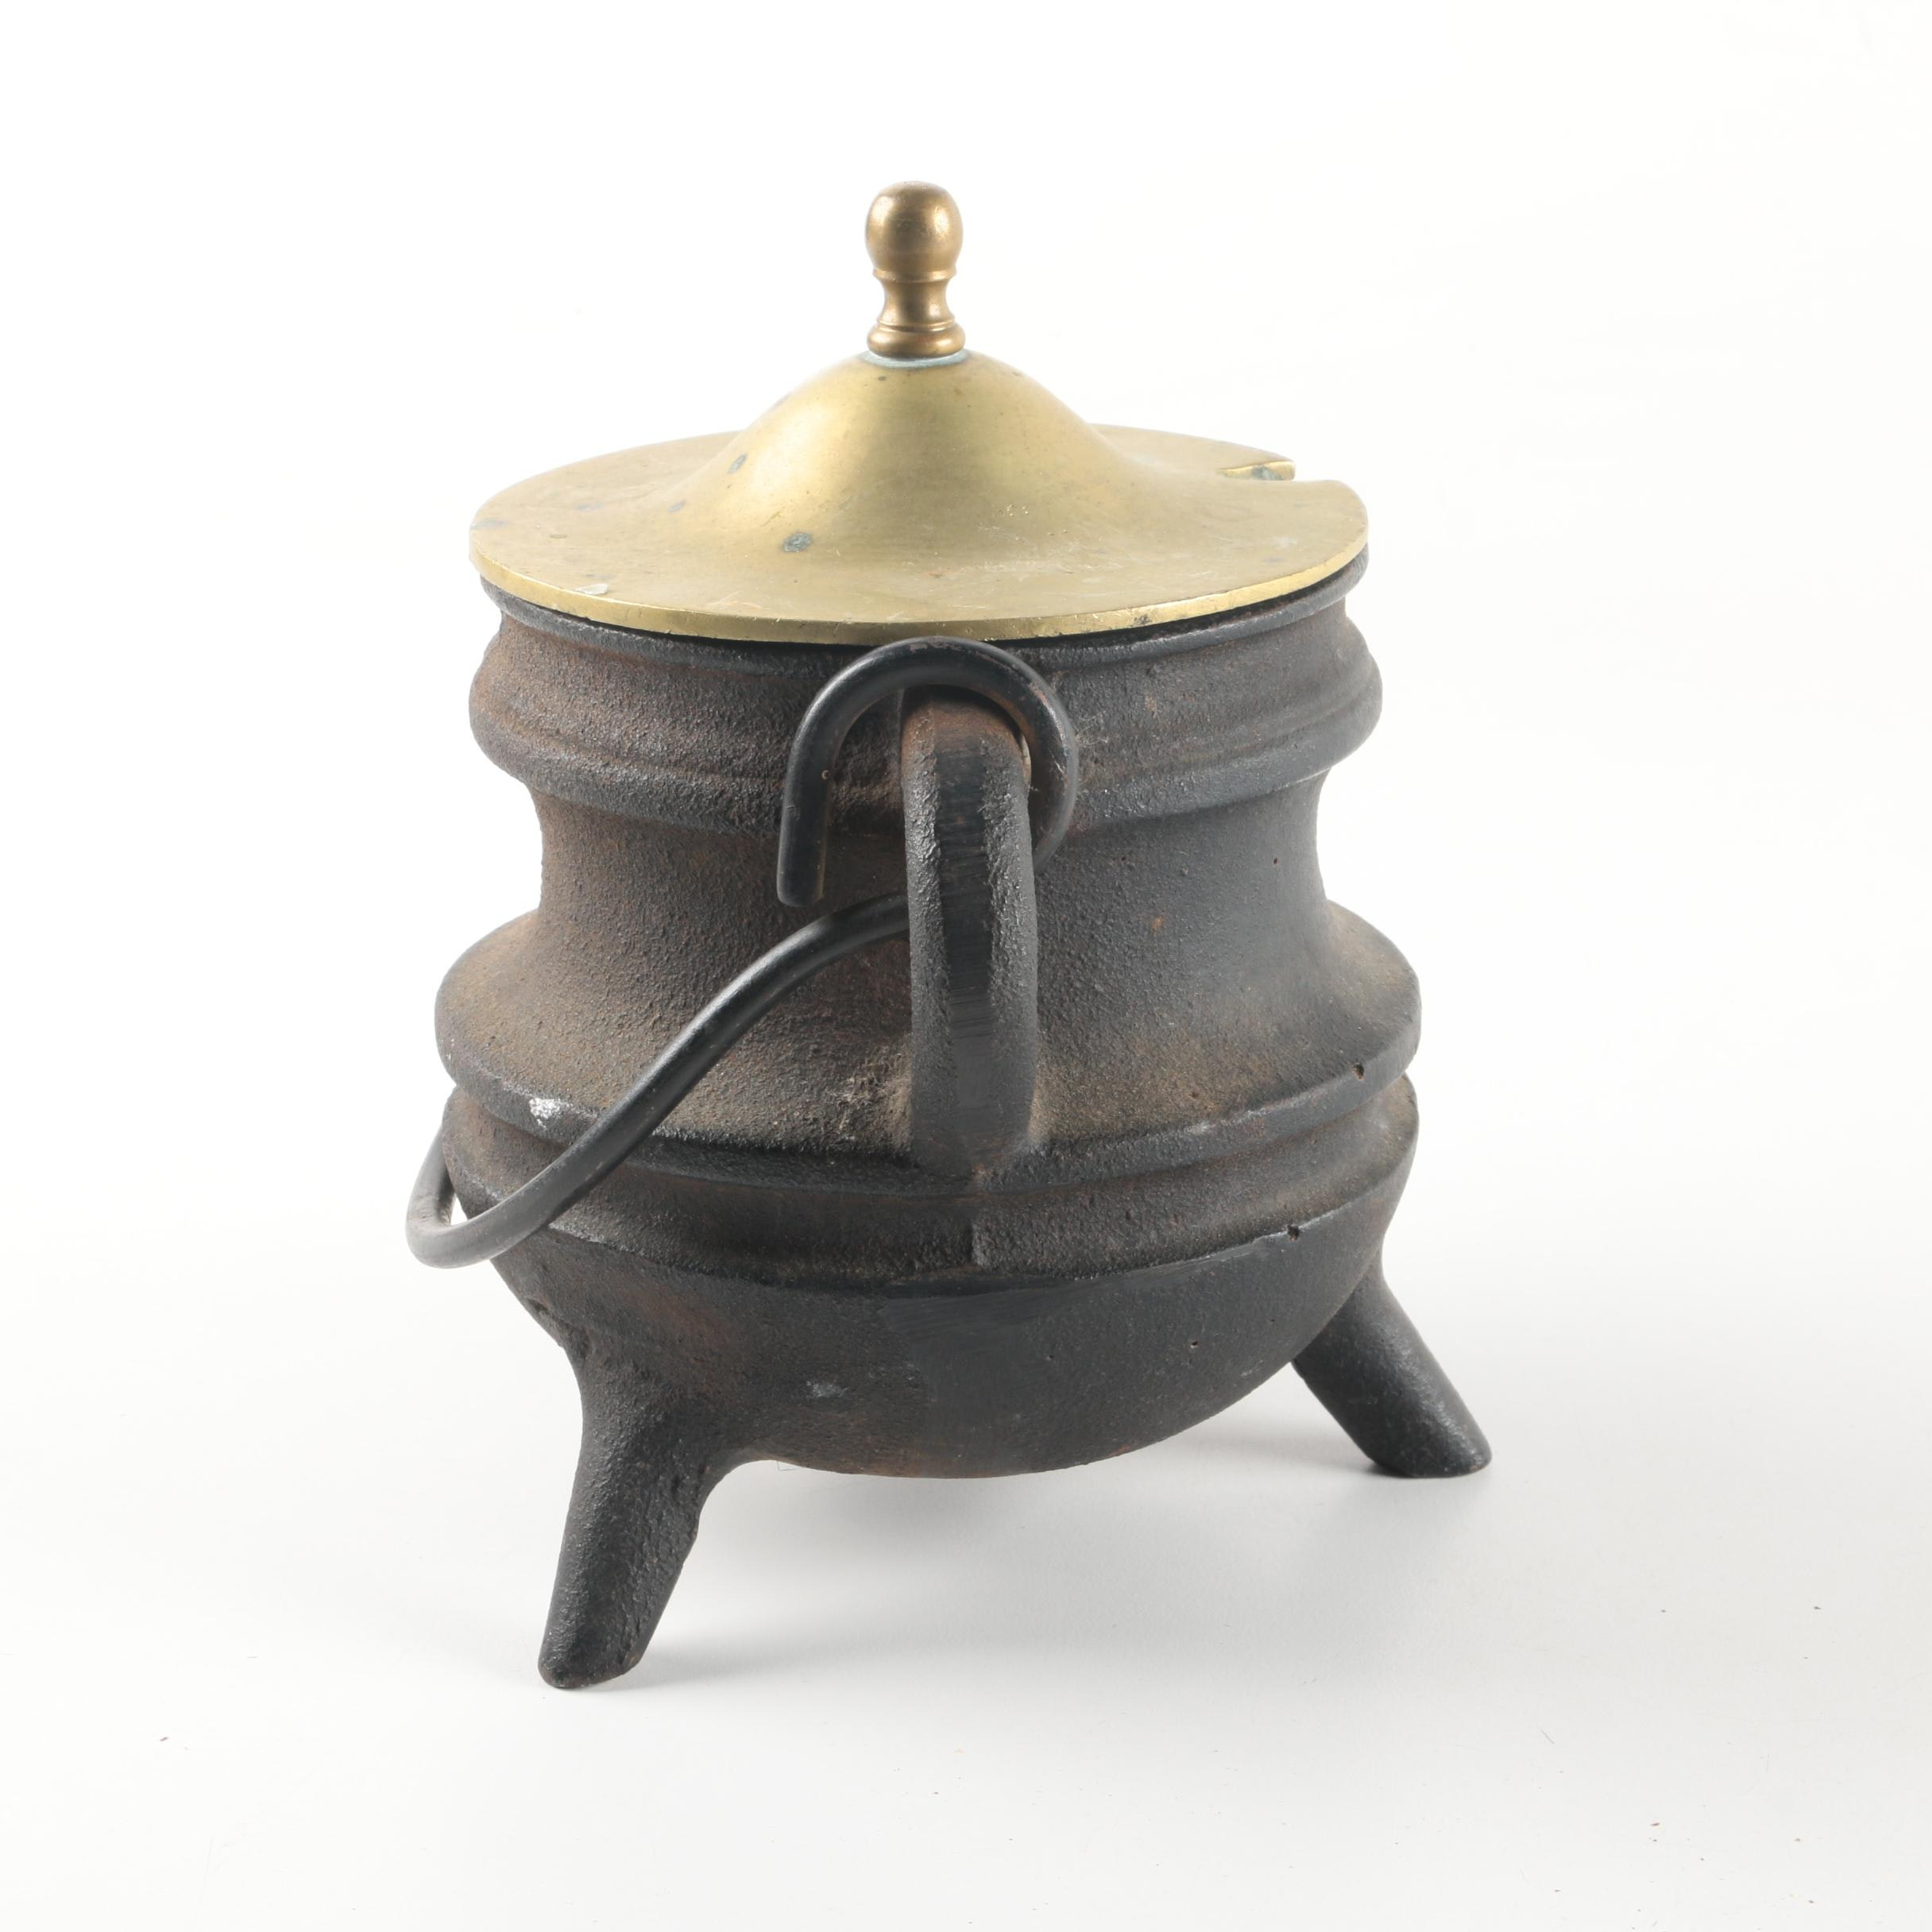 Cast Iron and Brass Footed Fire Starter Pot